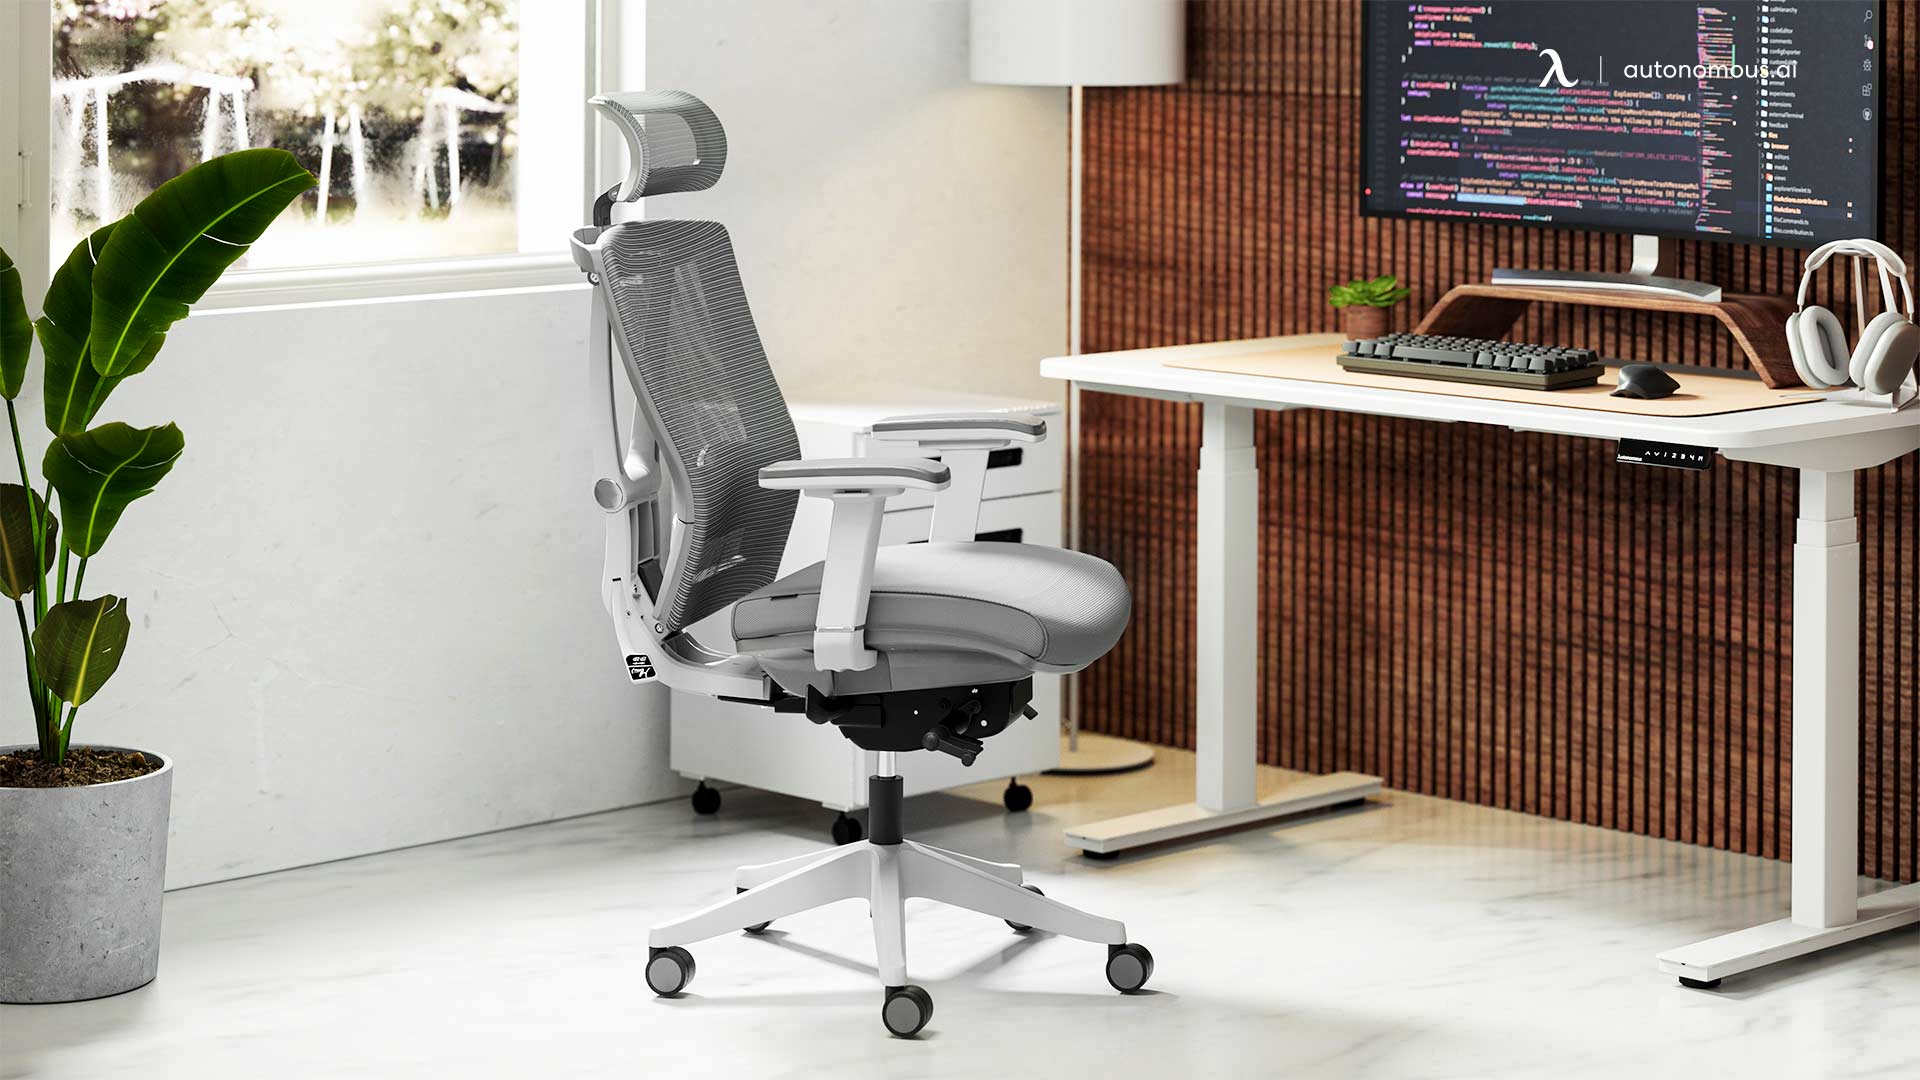 Autonomous office desk set: Sleek and Stylish